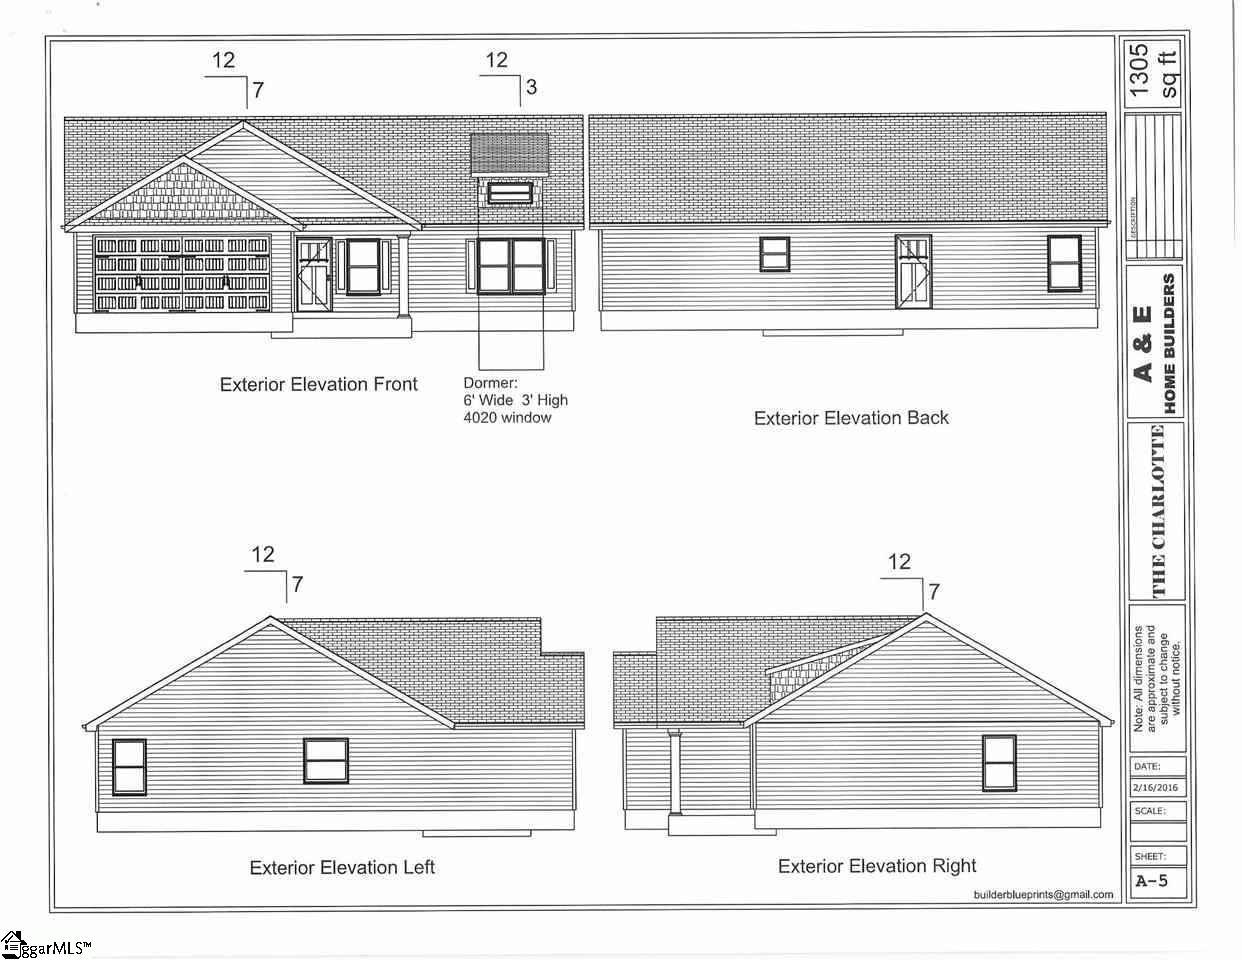 110 Dana Lynn Lane, #Lot 54, Pendleton, 29670 | Berkshire Hathaway  HomeServices C  Dan Joyner, REALTORS